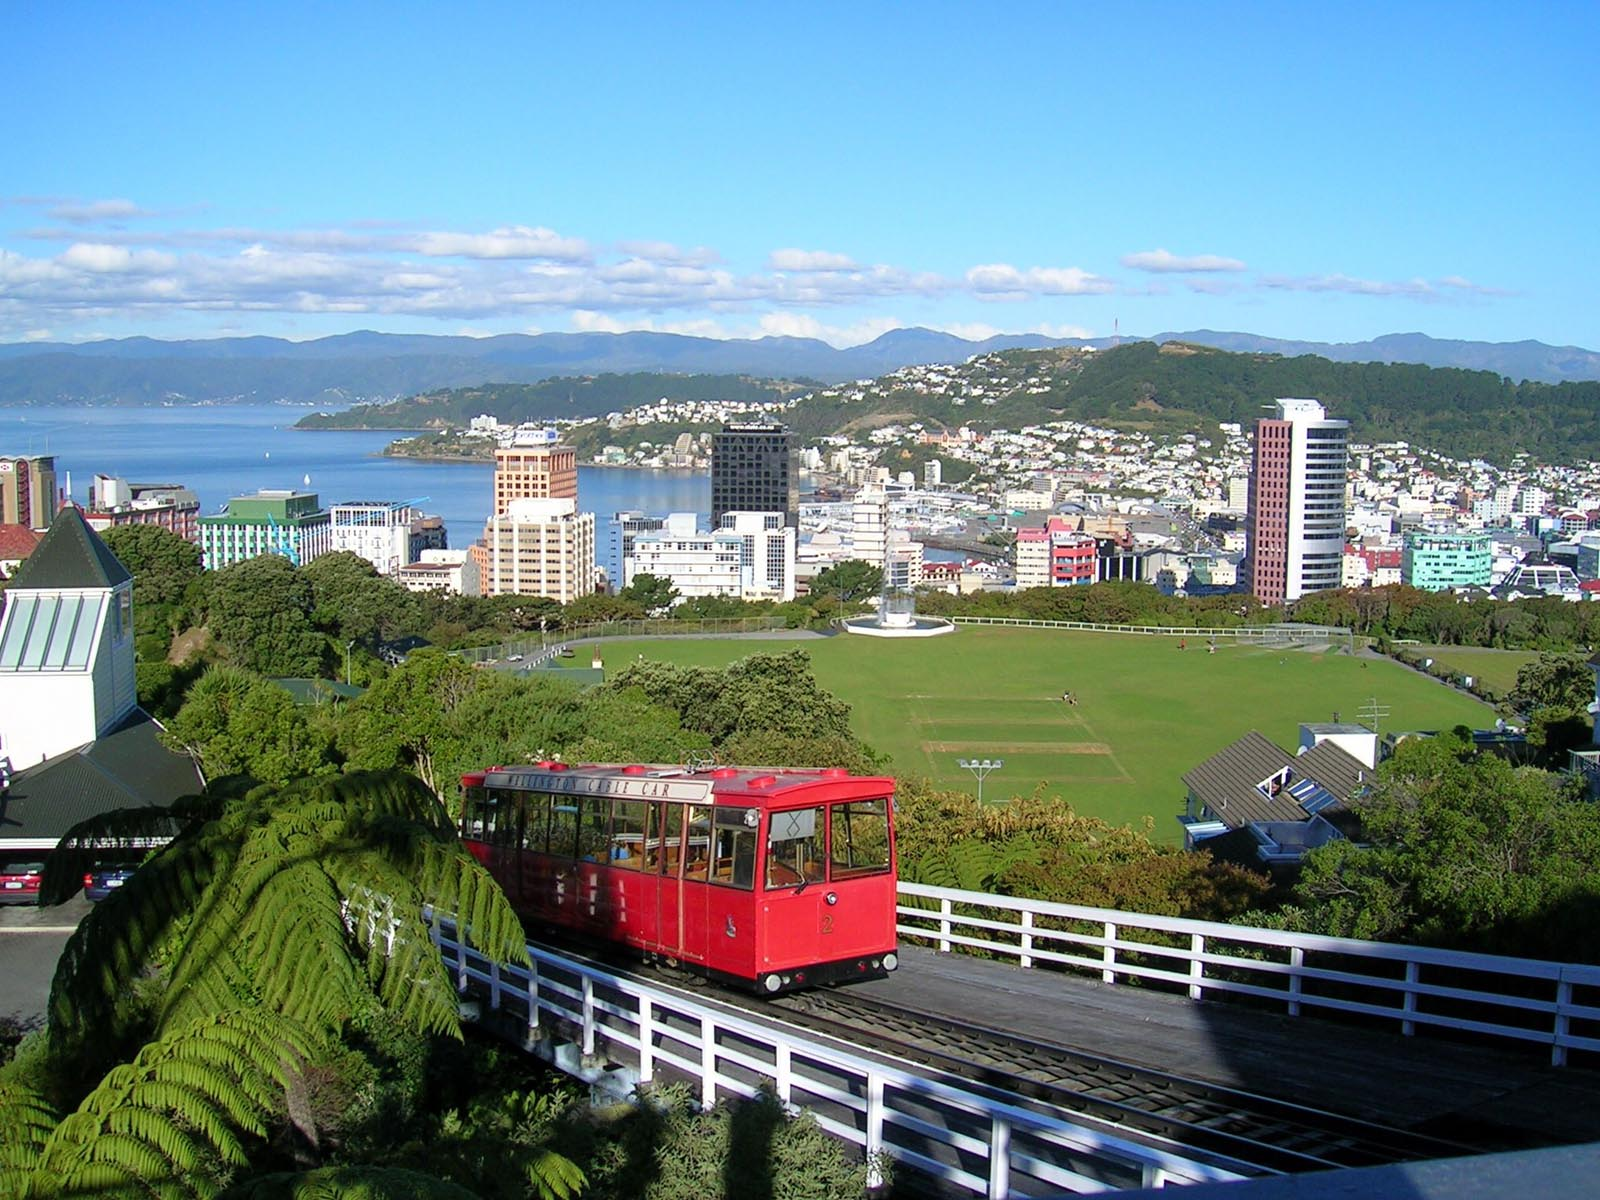 Beautiful Wellington 1600x1200 WallpapersWellington 1600x1200 1600x1200